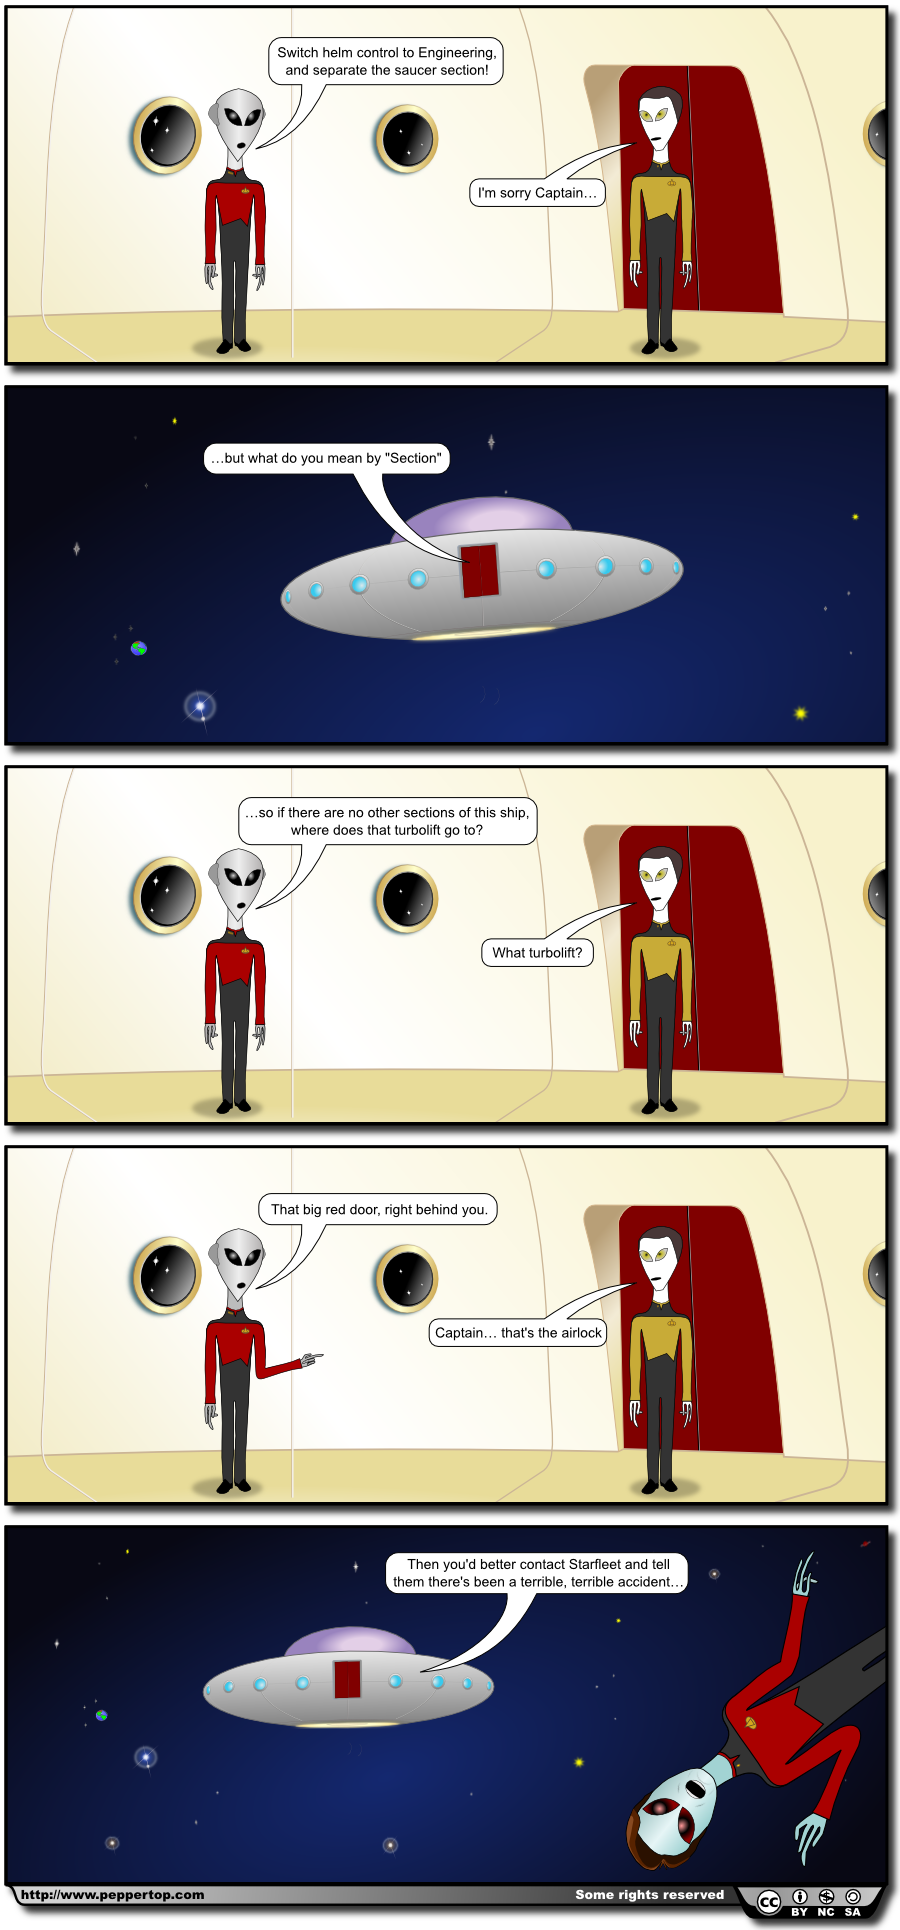 The Next Generation of Starship Design